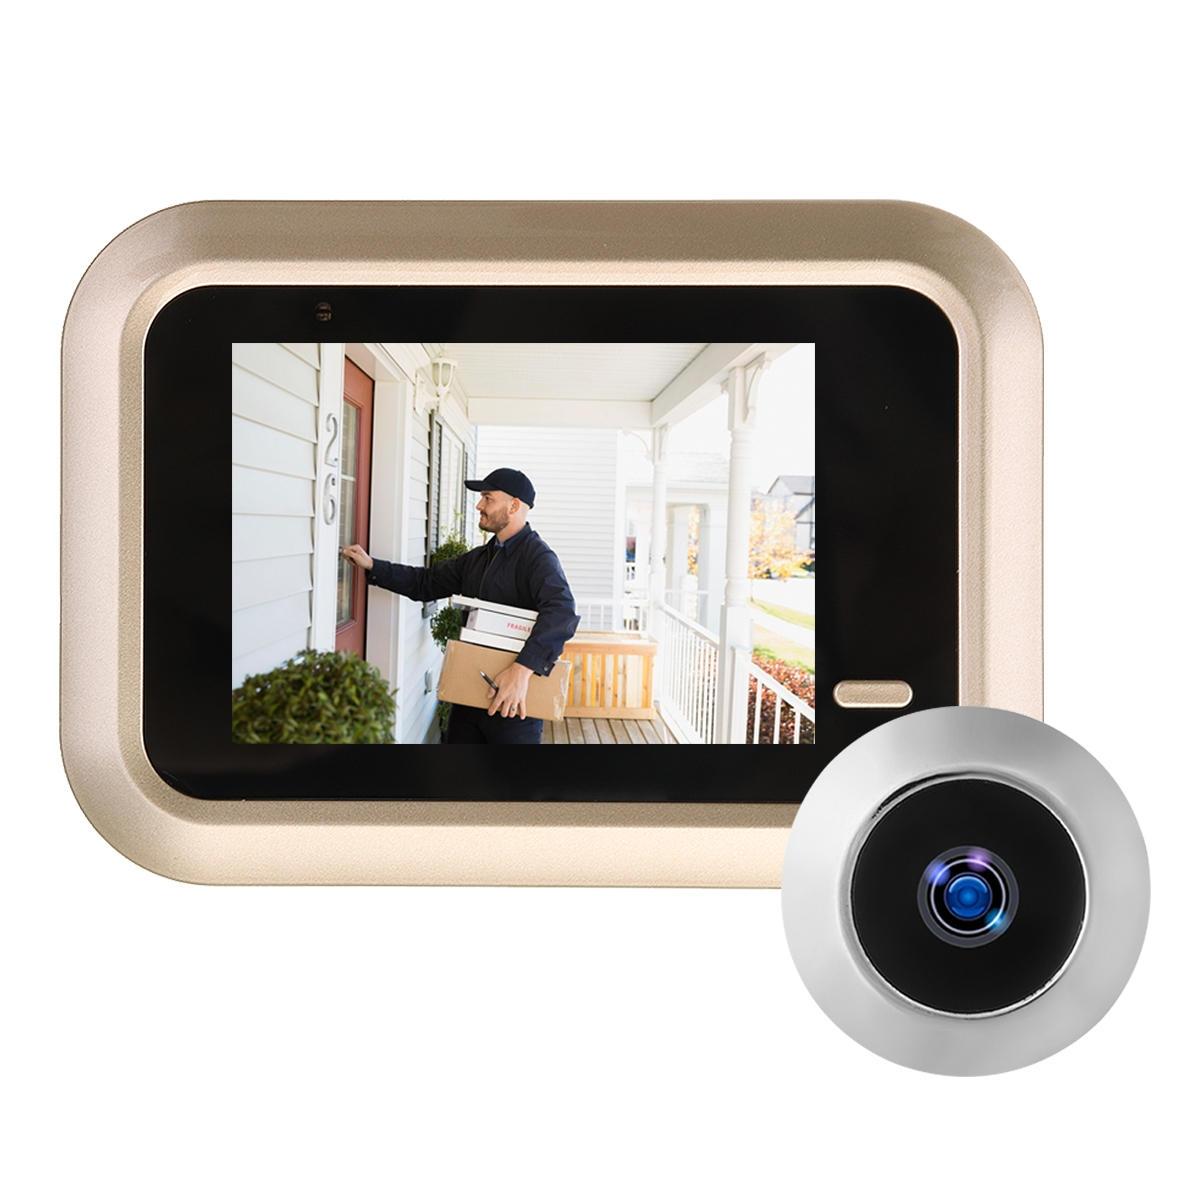 2,4 tums LCD Digital Video Doorbell Viewer Peephole Security Dörrövervakningskamera